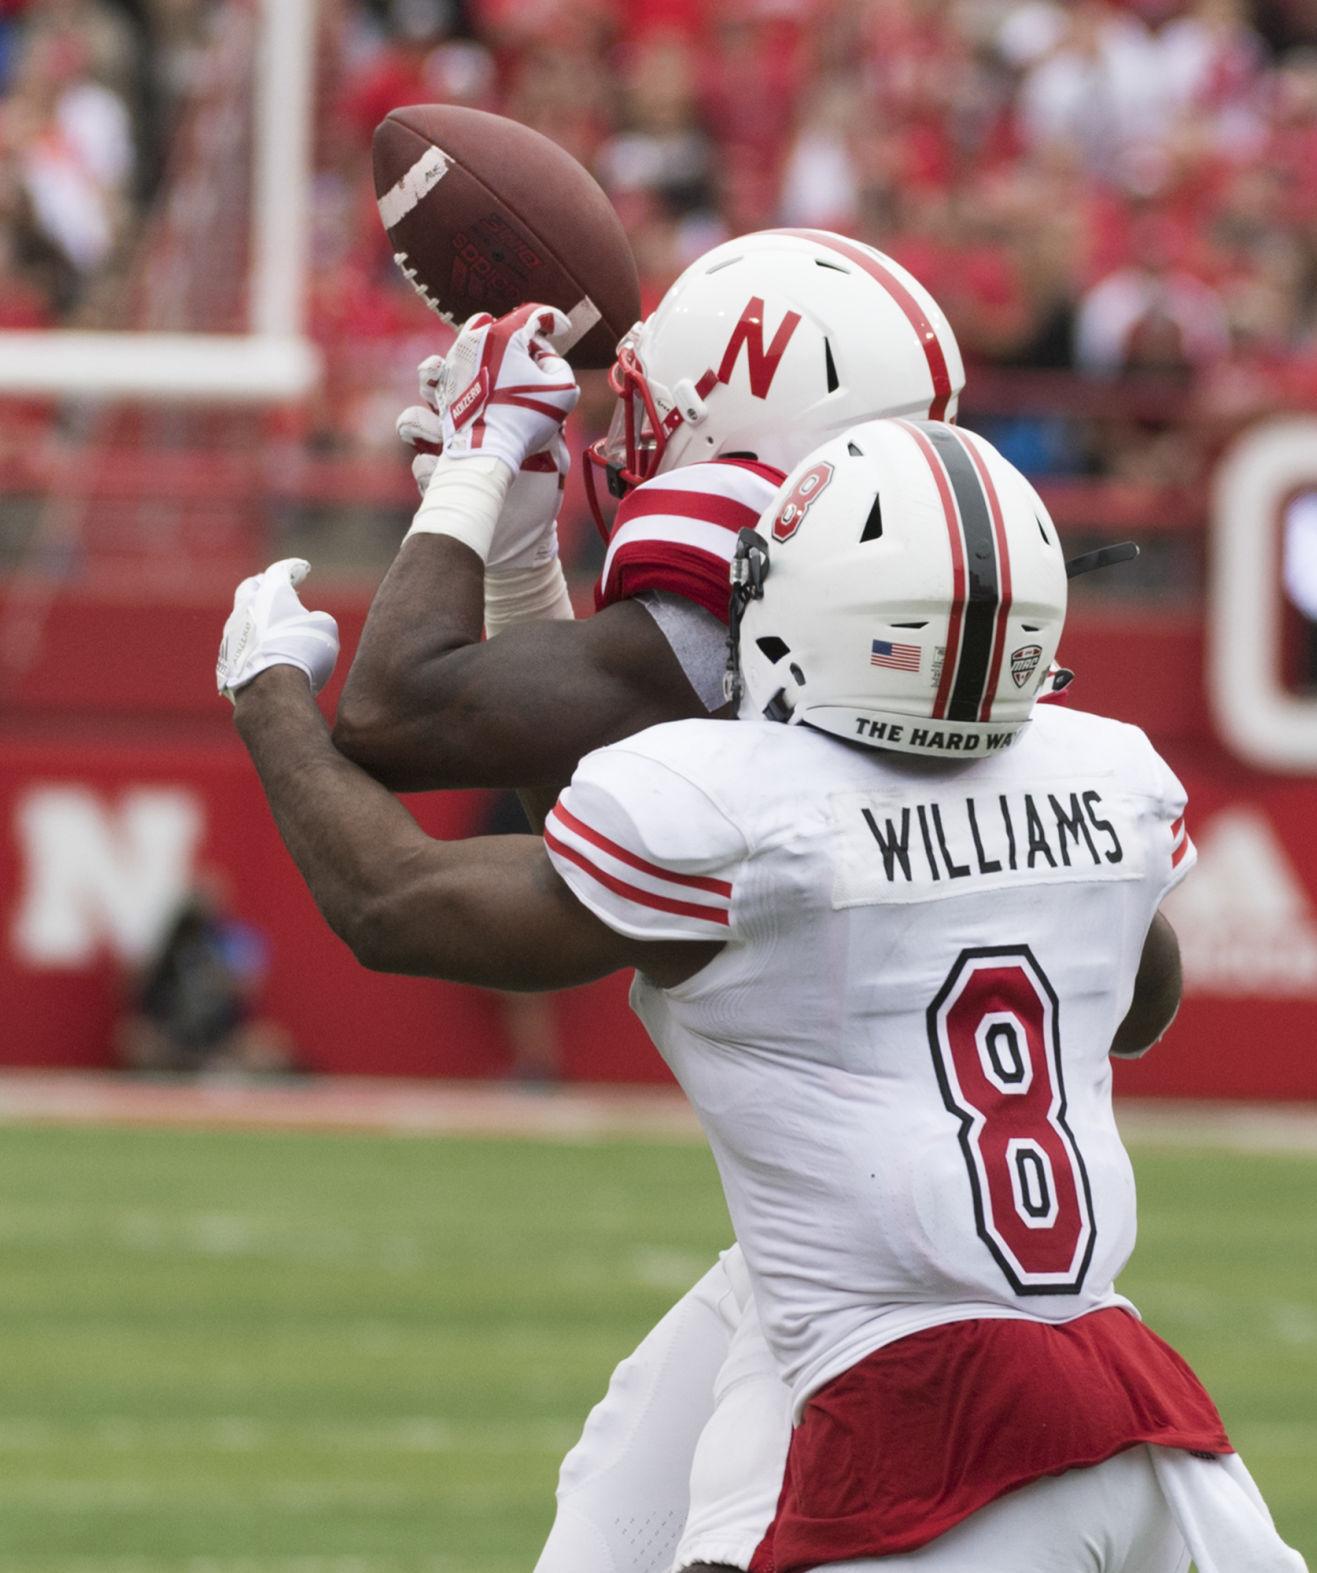 NIU makes Nebraska 4th Big Ten victim of past five years